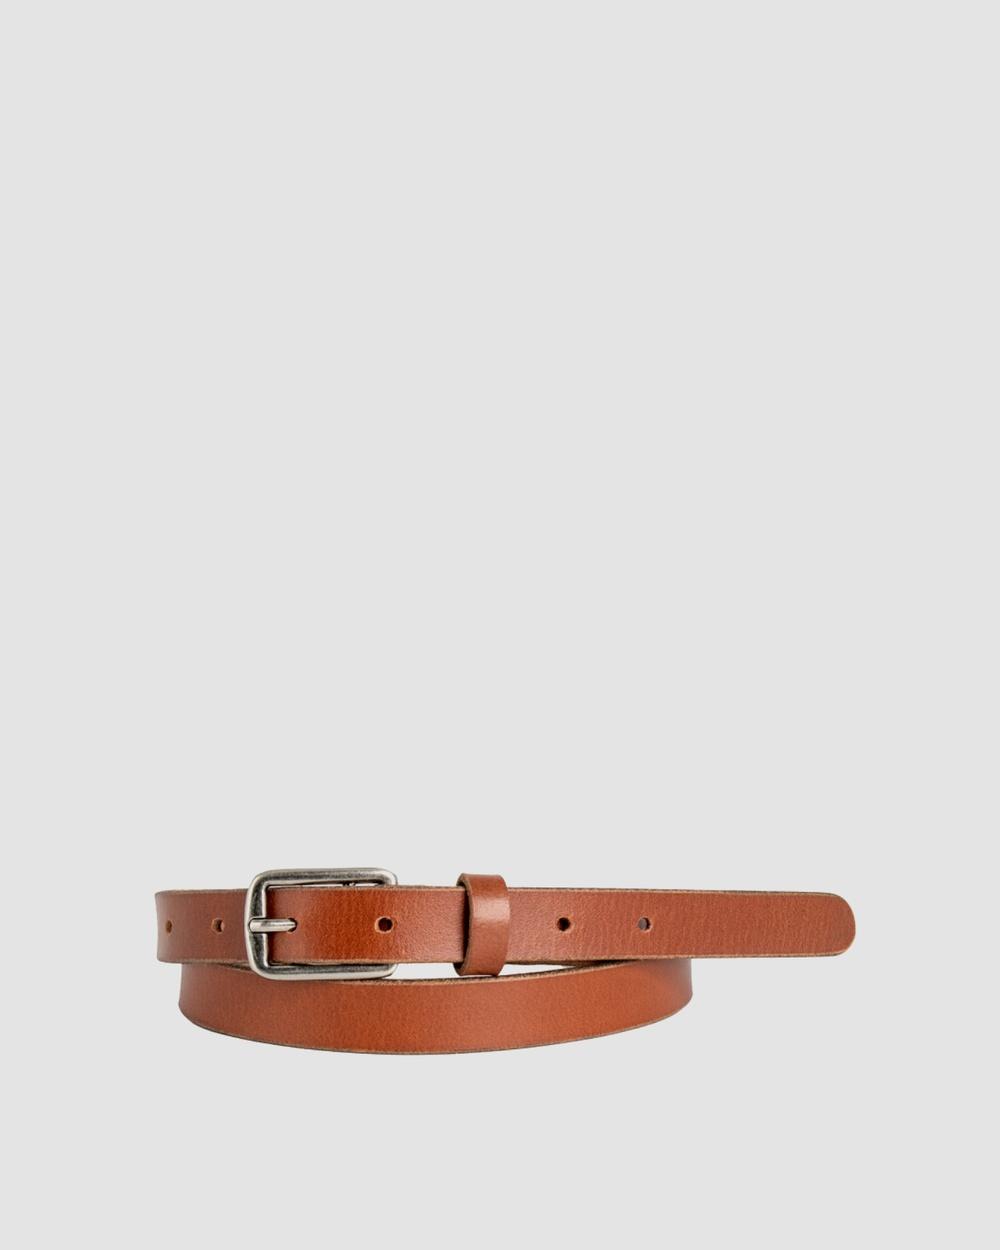 Loop Leather Co Cloe Belts Chestnut